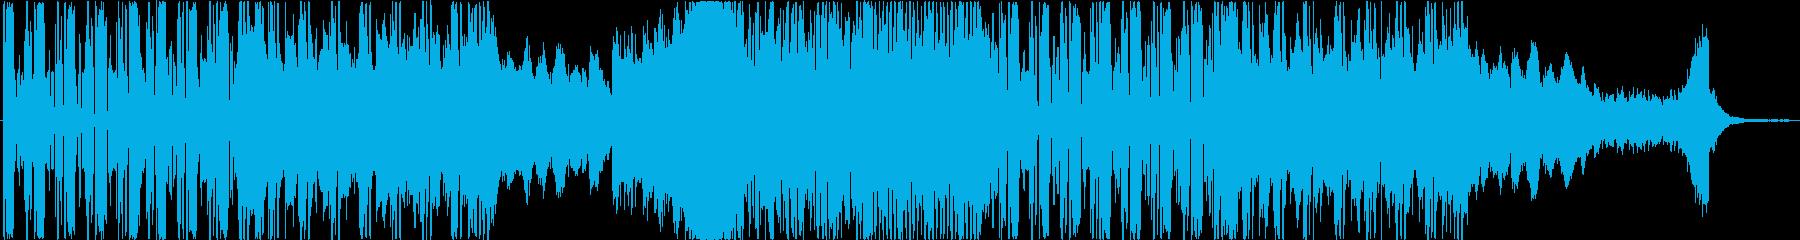 CM】ダブステップ コミカル オシャレの再生済みの波形